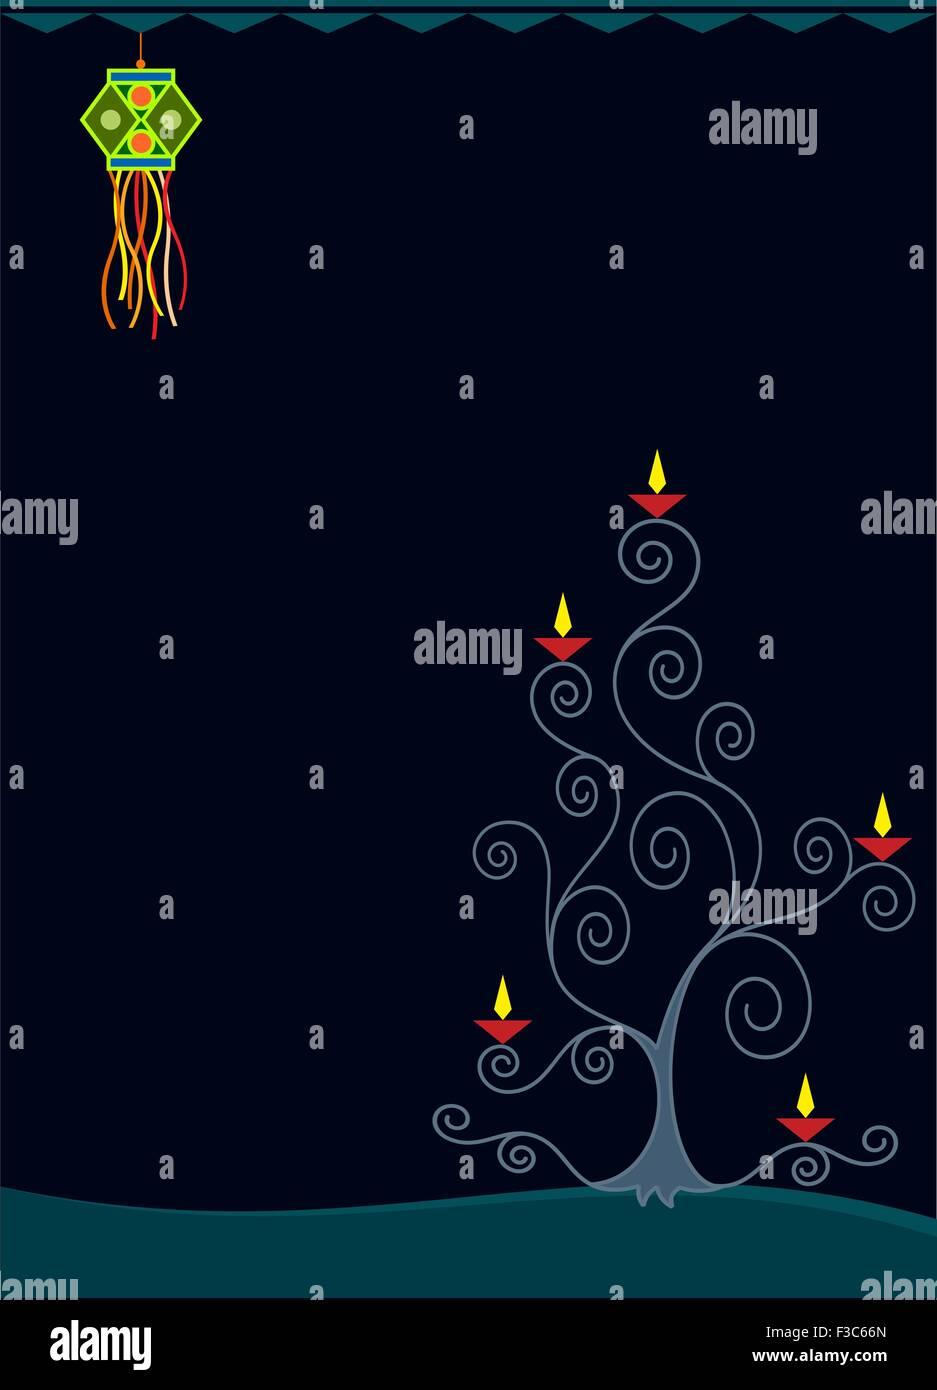 Artistic vector diwali diya design stock photos artistic vector diwali greeting design vector art stock image m4hsunfo